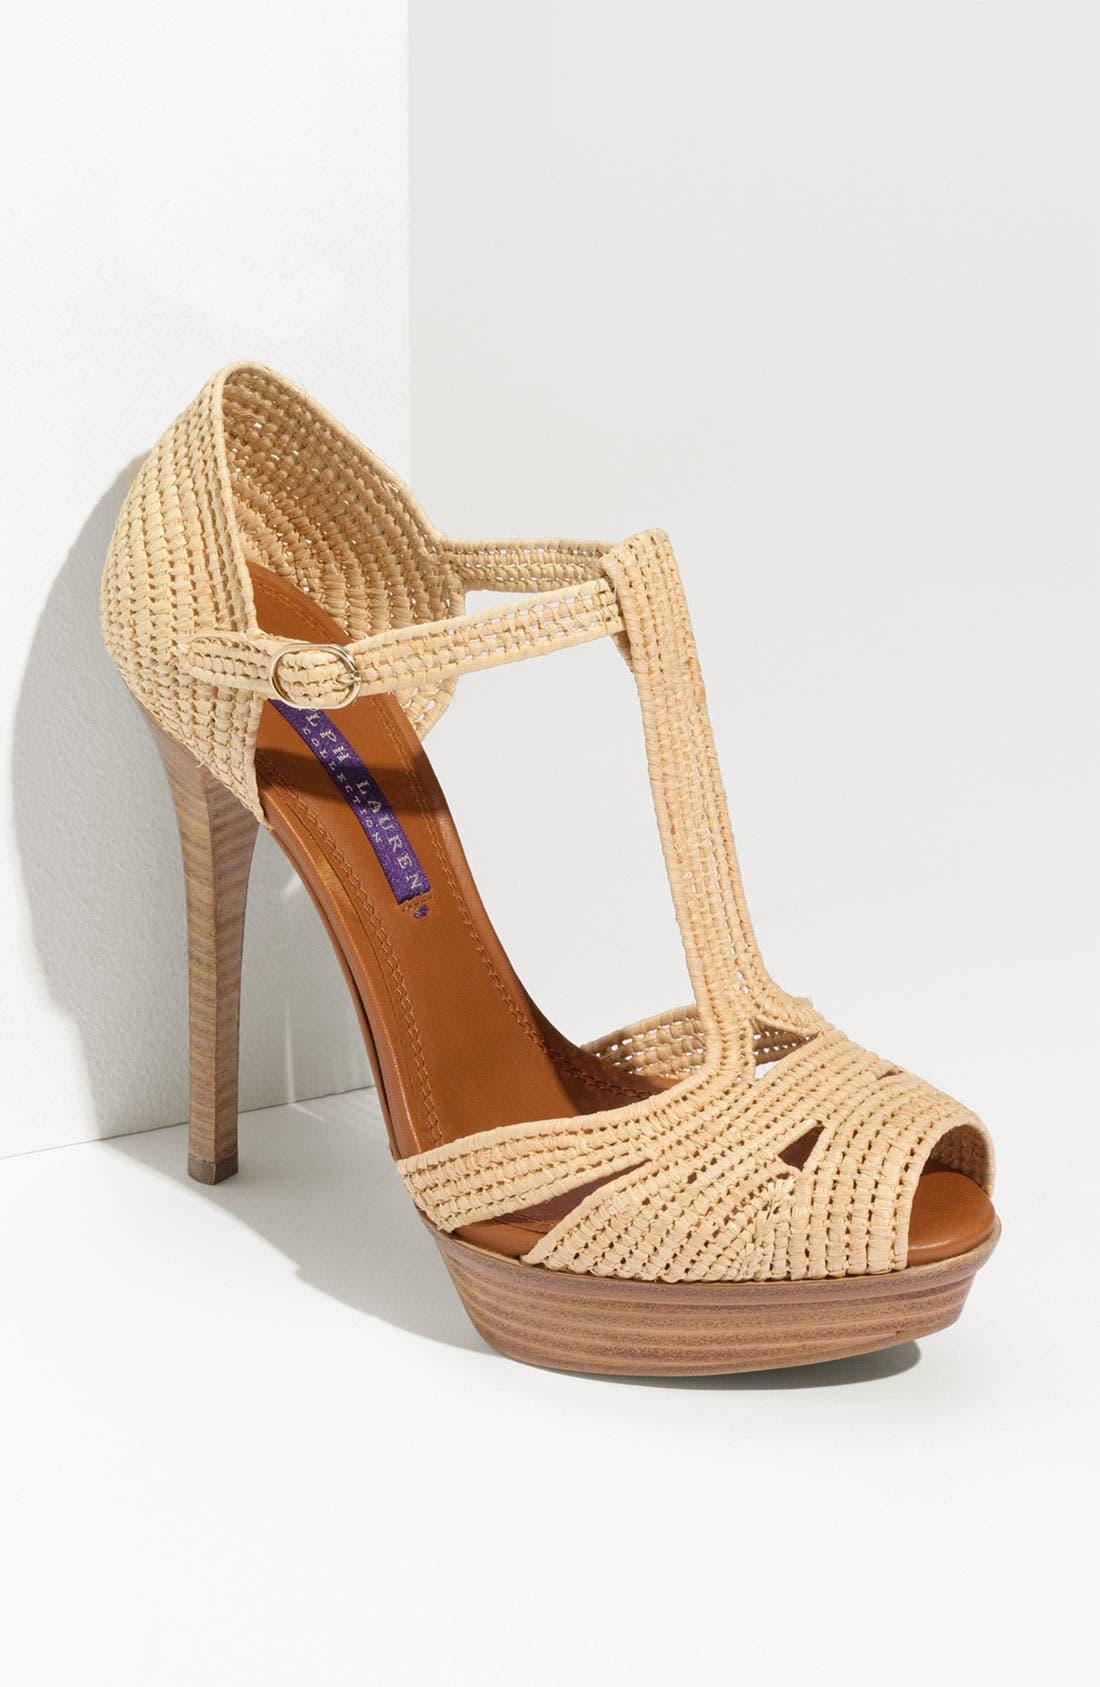 Alternate Image 1 Selected - Ralph Lauren Collection 'Jedina' Sandal